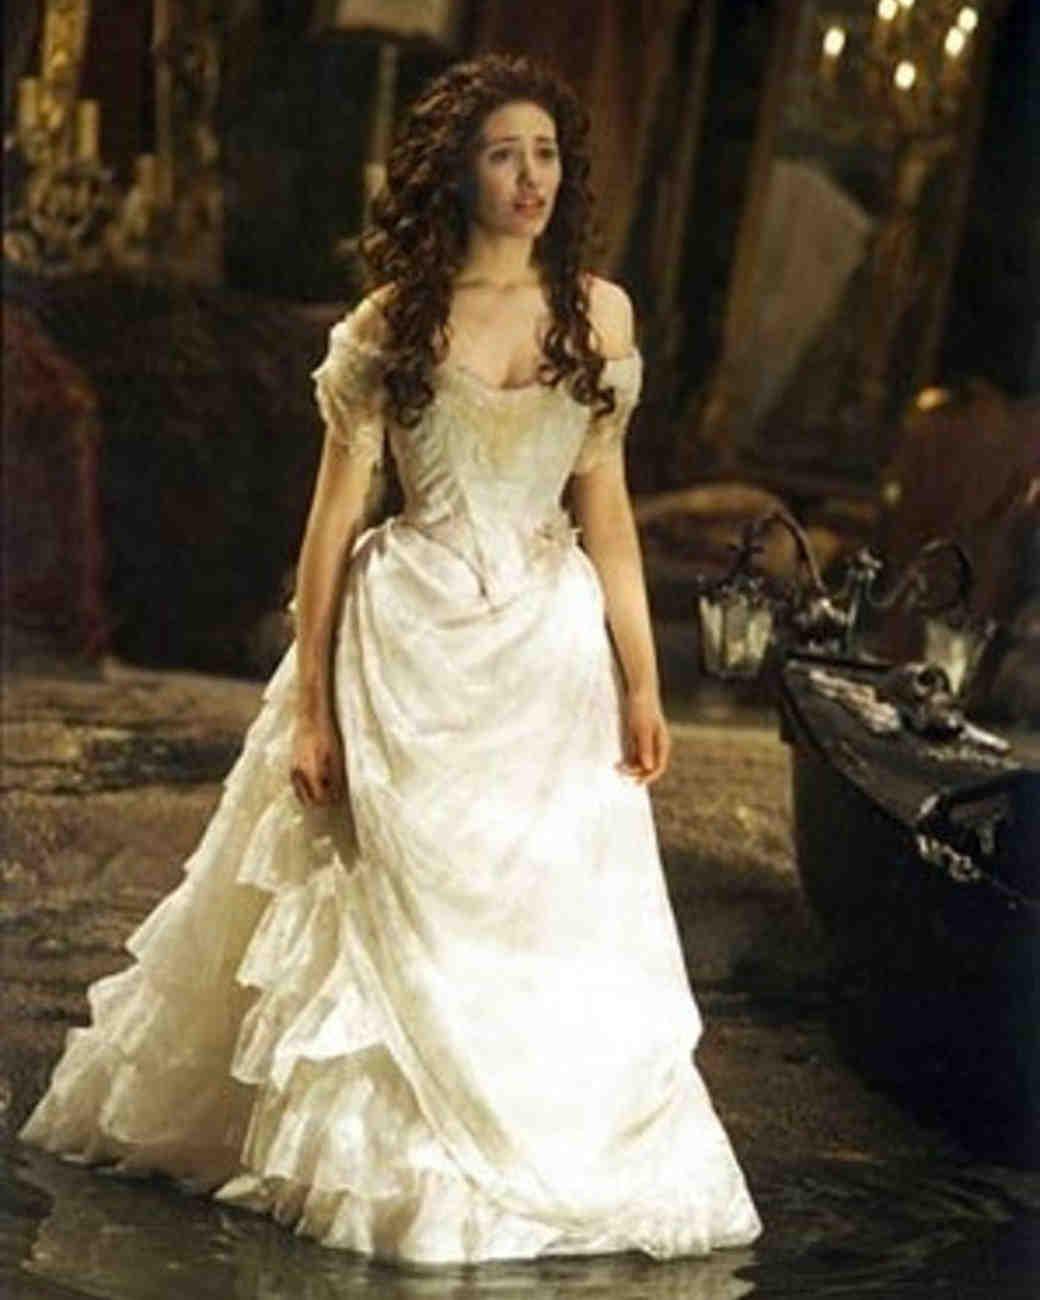 movie-wedding-dresses-the-phantom-of-the-opera-emmy-rossum-0316.jpg